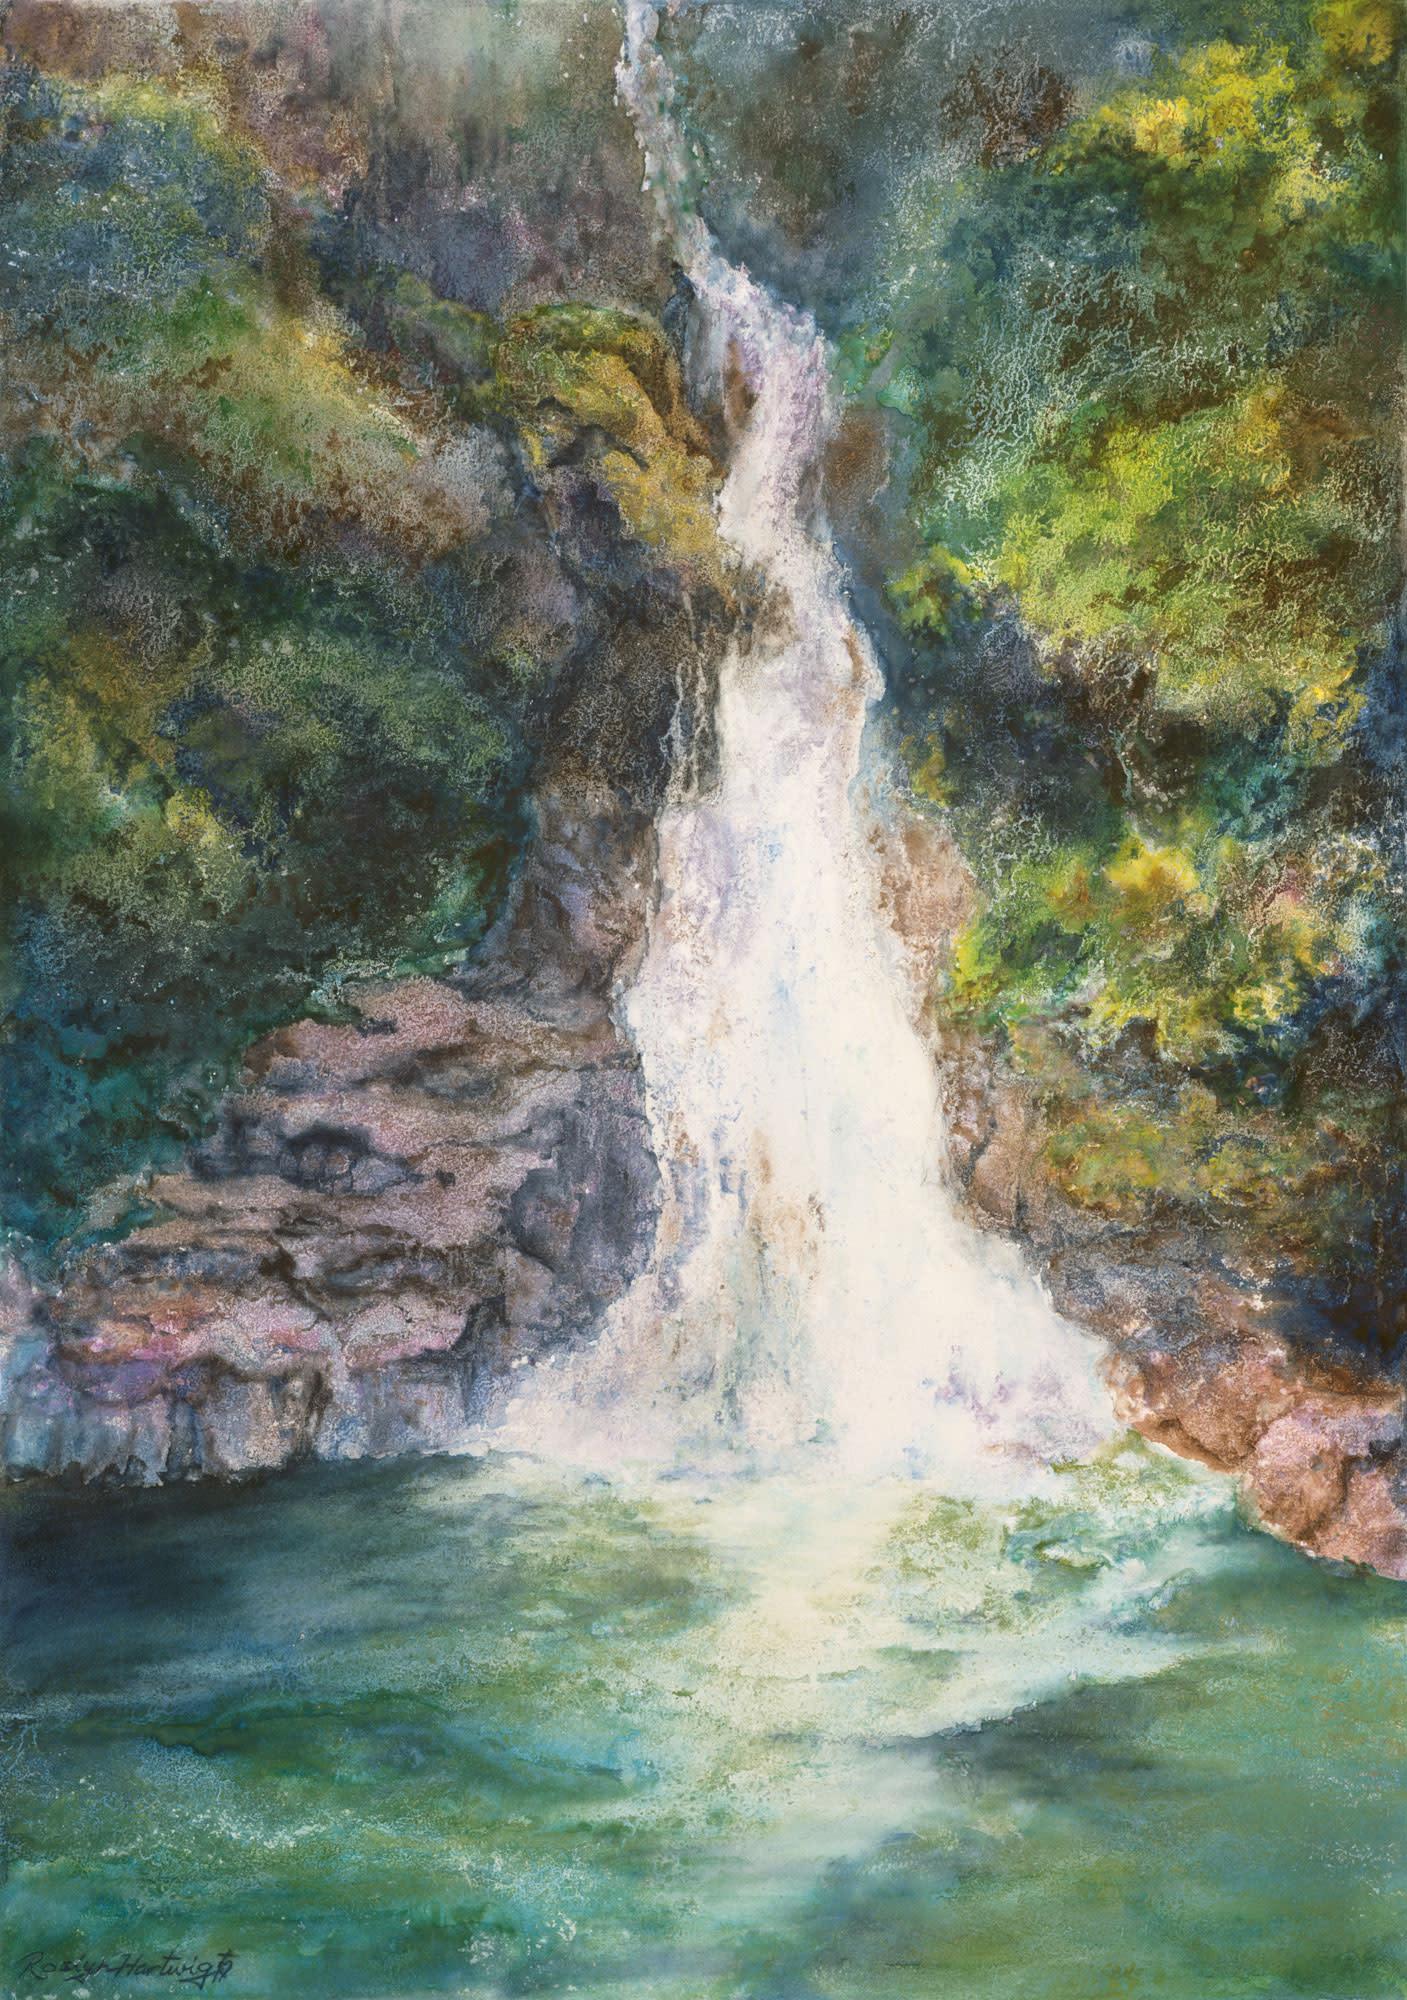 Rhar 012 fountain of triumph curtain of hope rxaboa